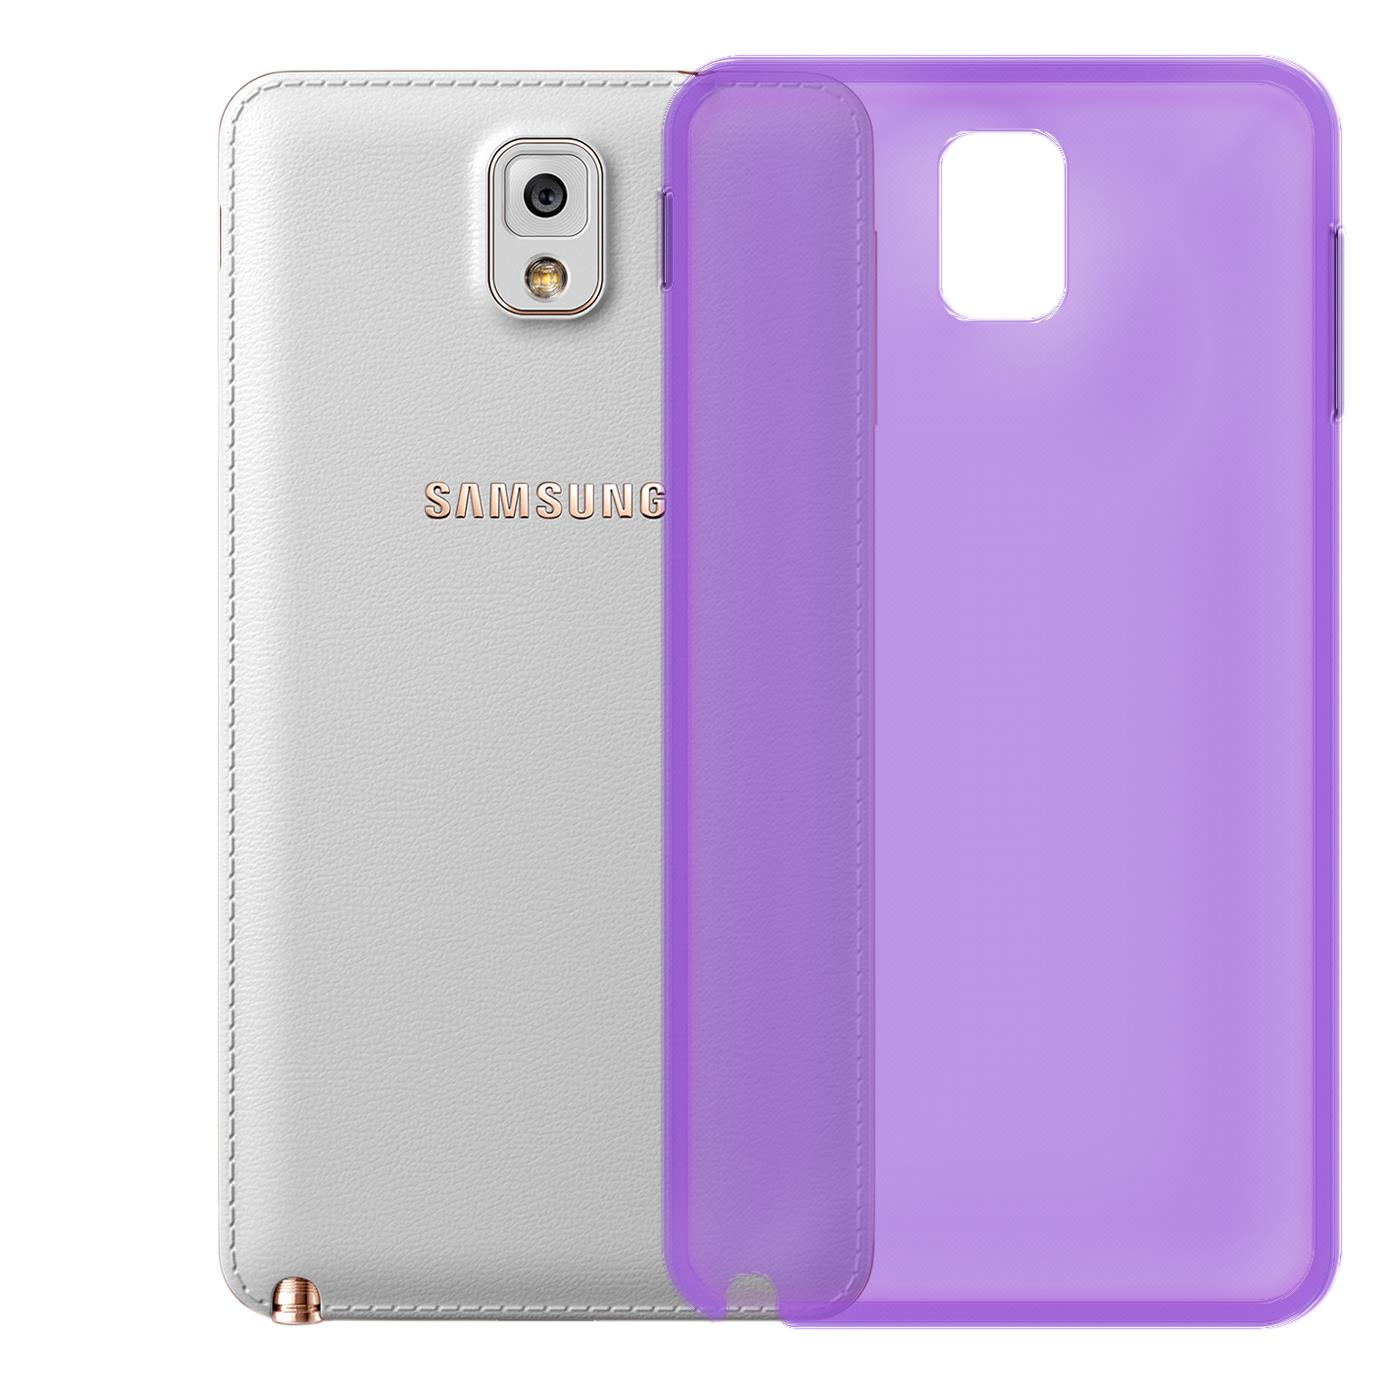 Samsung-Galaxy-Note-4-Thin-Silikon-Klar-Case-Cover-Ultra-Slim-Stossfeste-Gel Indexbild 20